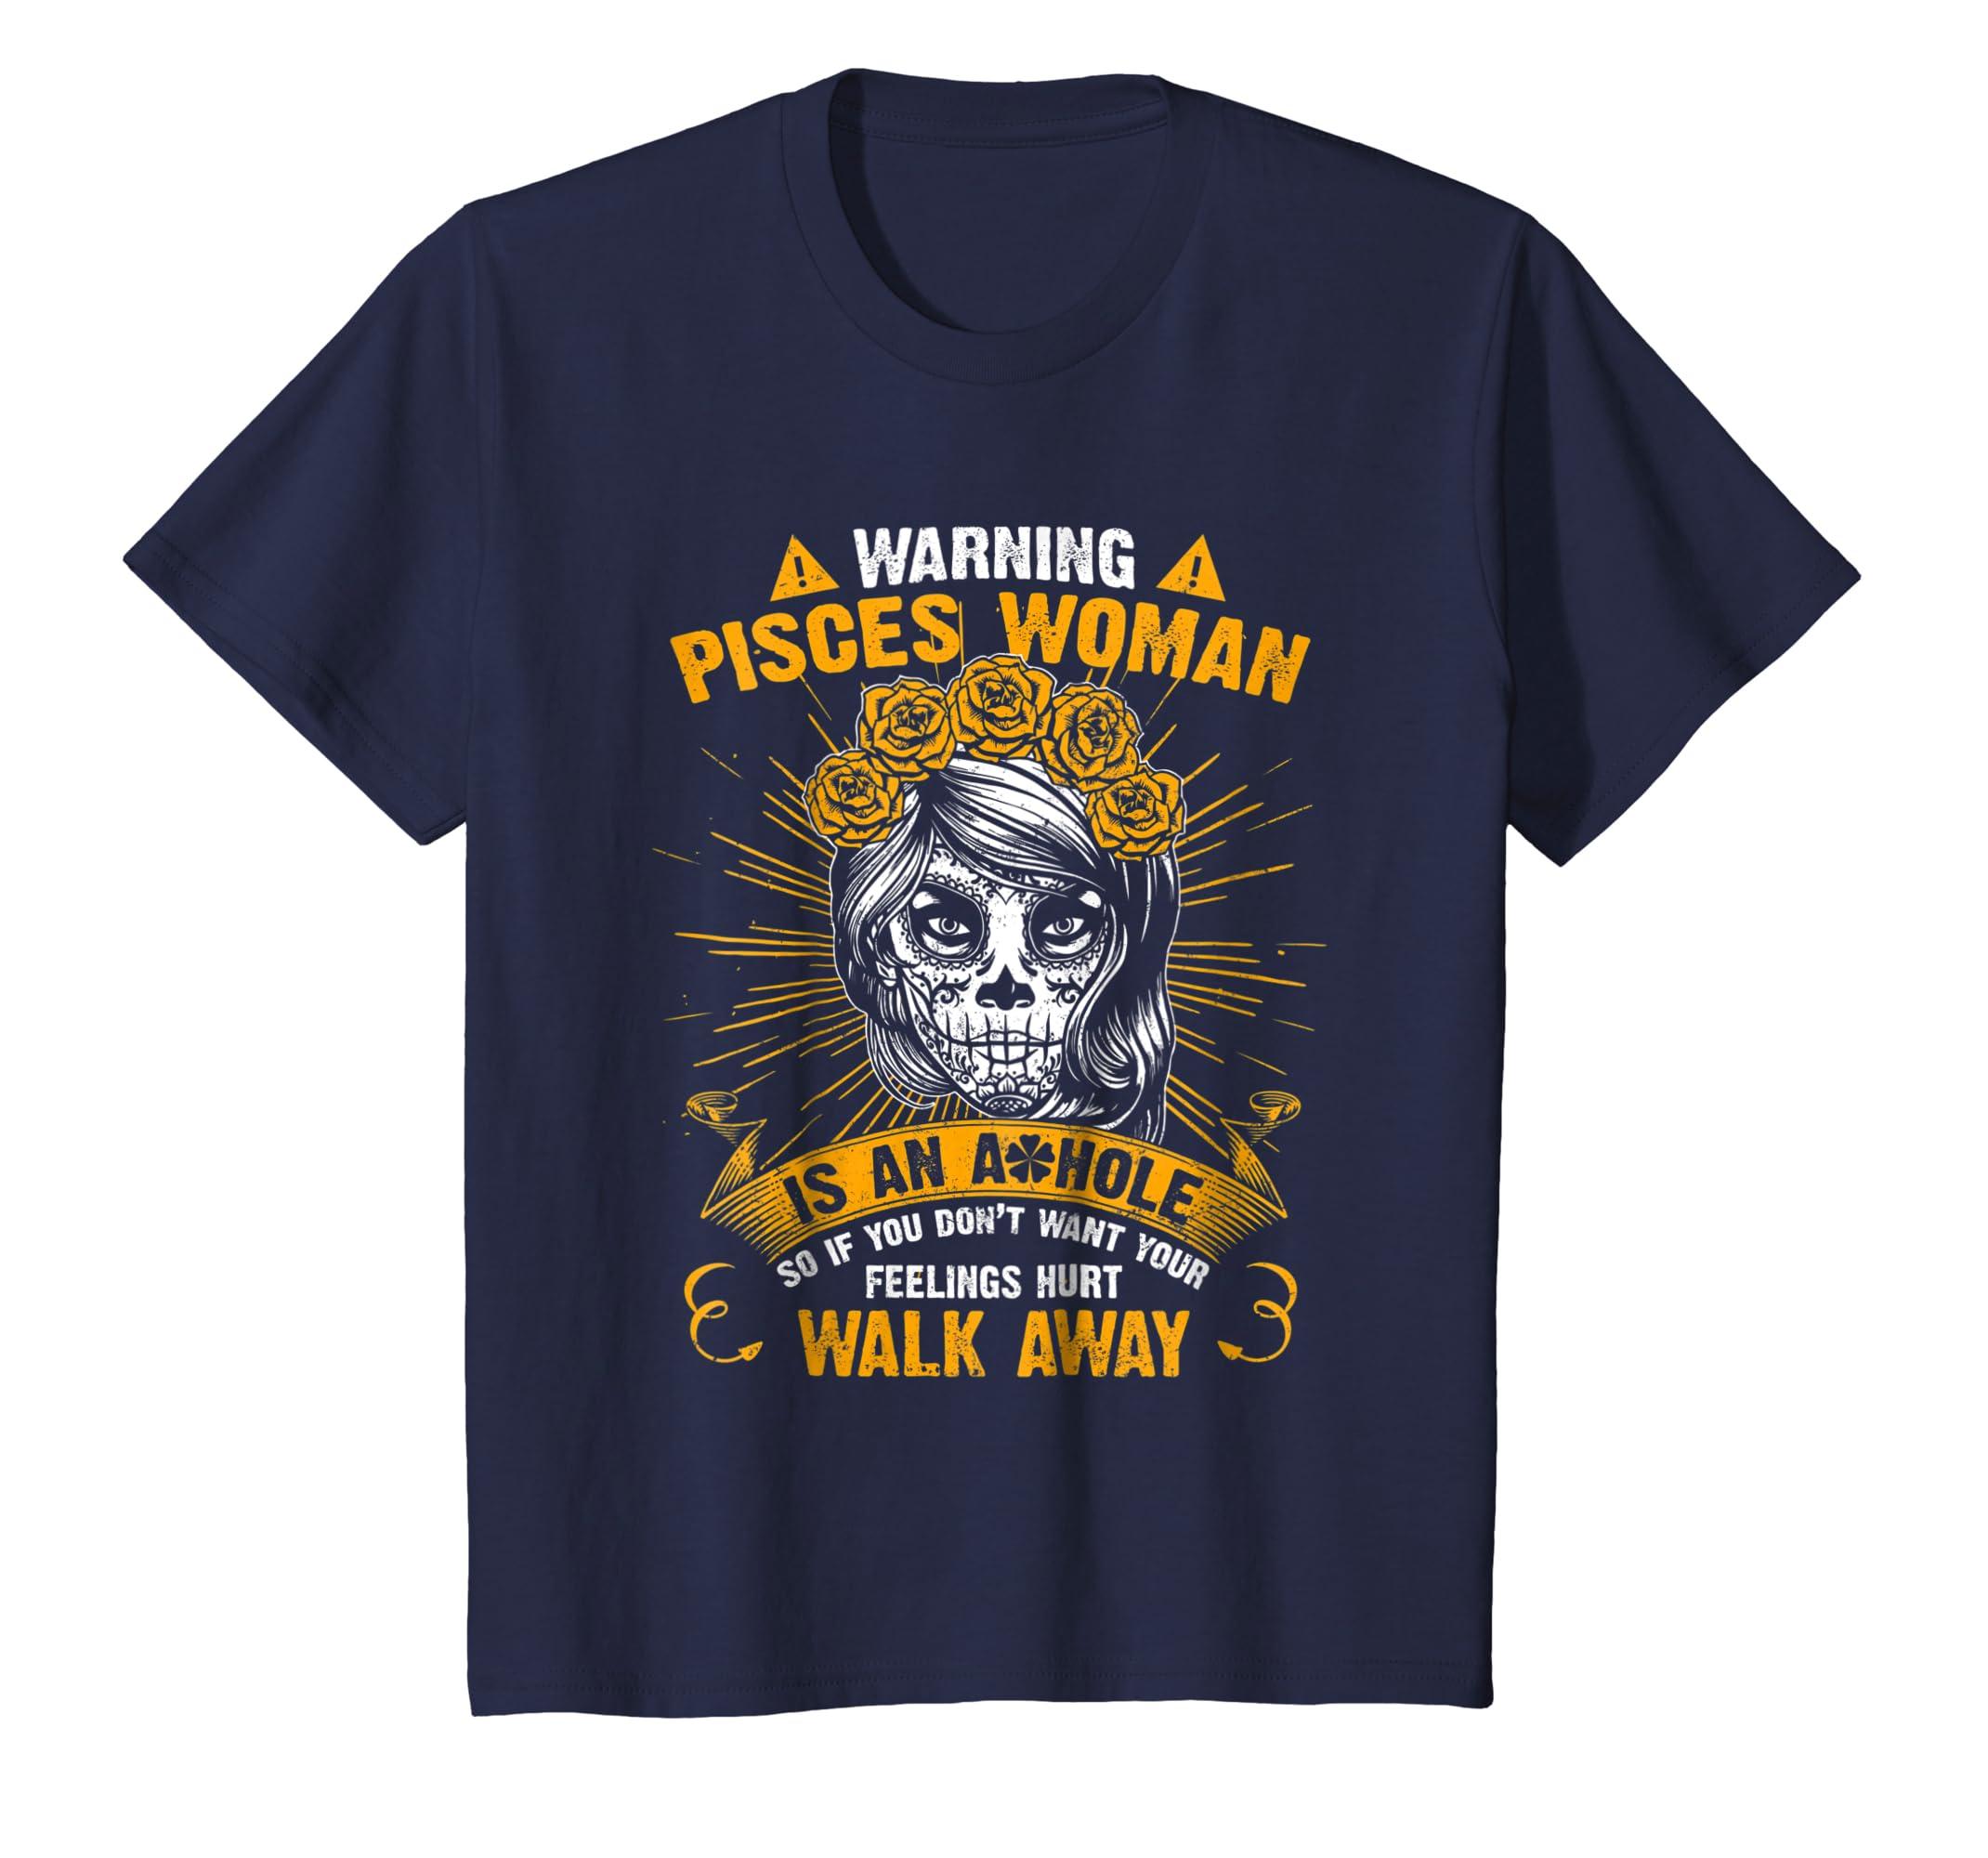 Amazon com: Warning Pisces Woman T-shirt Dia De Los Muertos